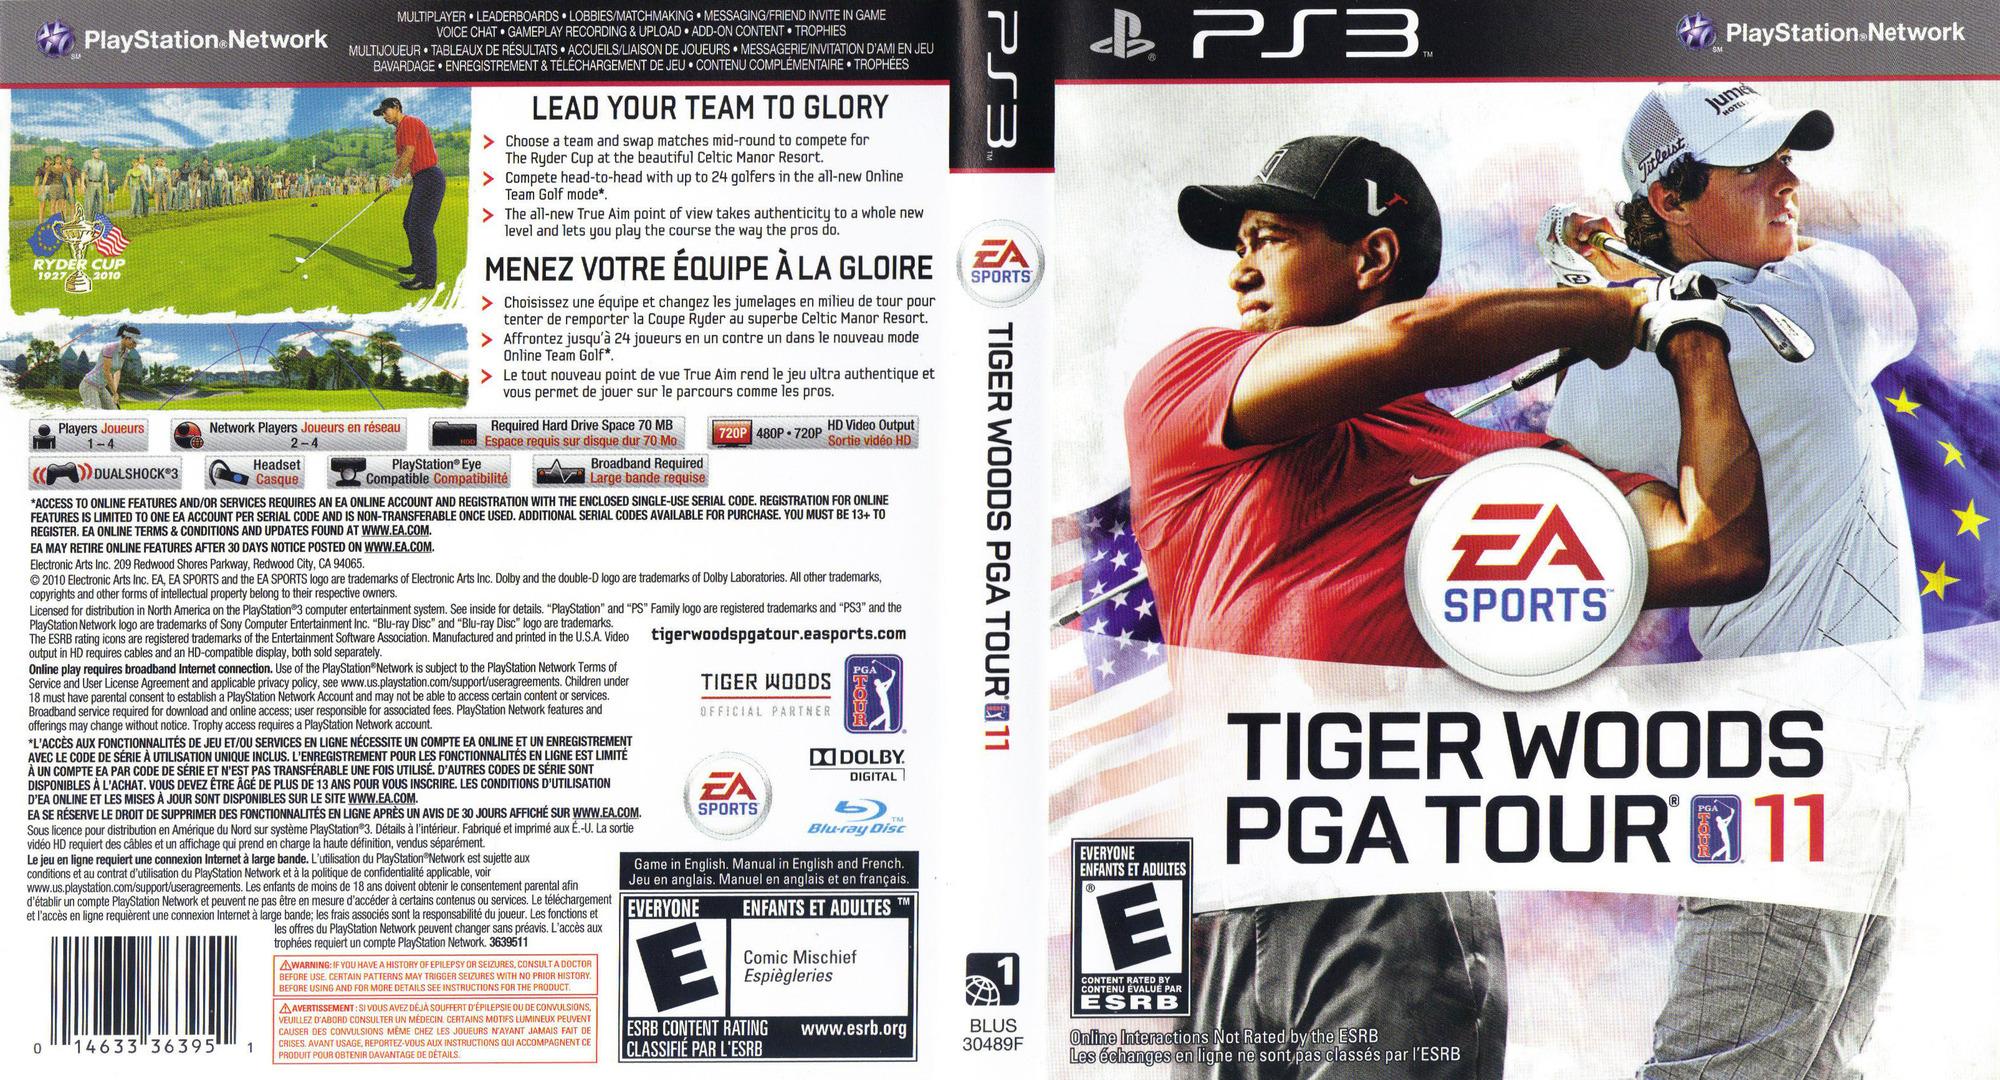 Tiger Woods PGA Tour '11 PS3 coverfullHQ (BLUS30489)